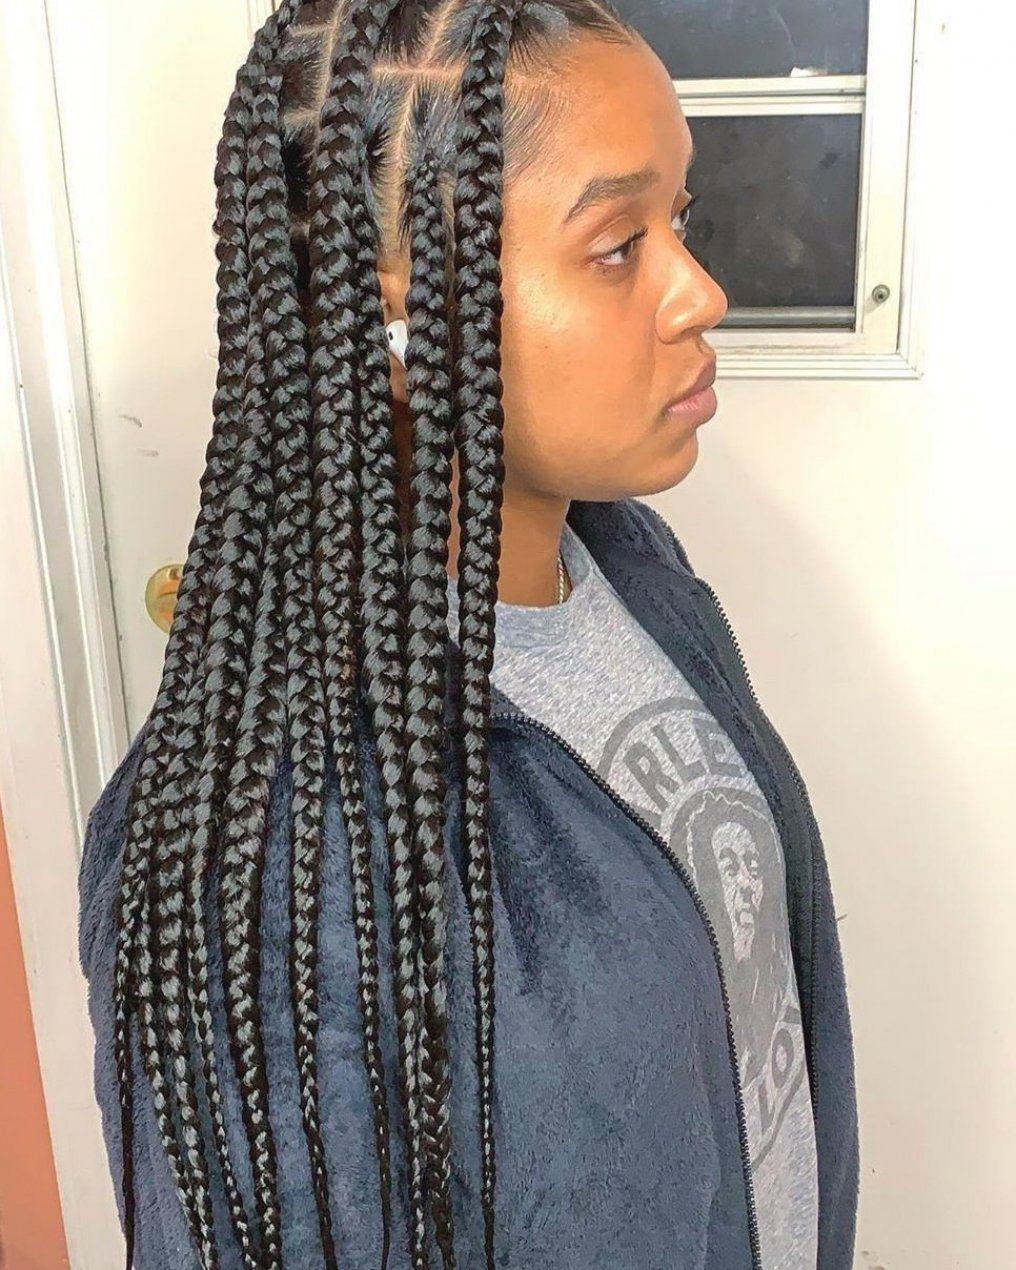 Hair Large Knotless Braids Large Knotless Box Braids Black Girl Braids Goddess Braids Bra In 2020 Braids With Curls Box Braids Medium Length Thick Hair Styles